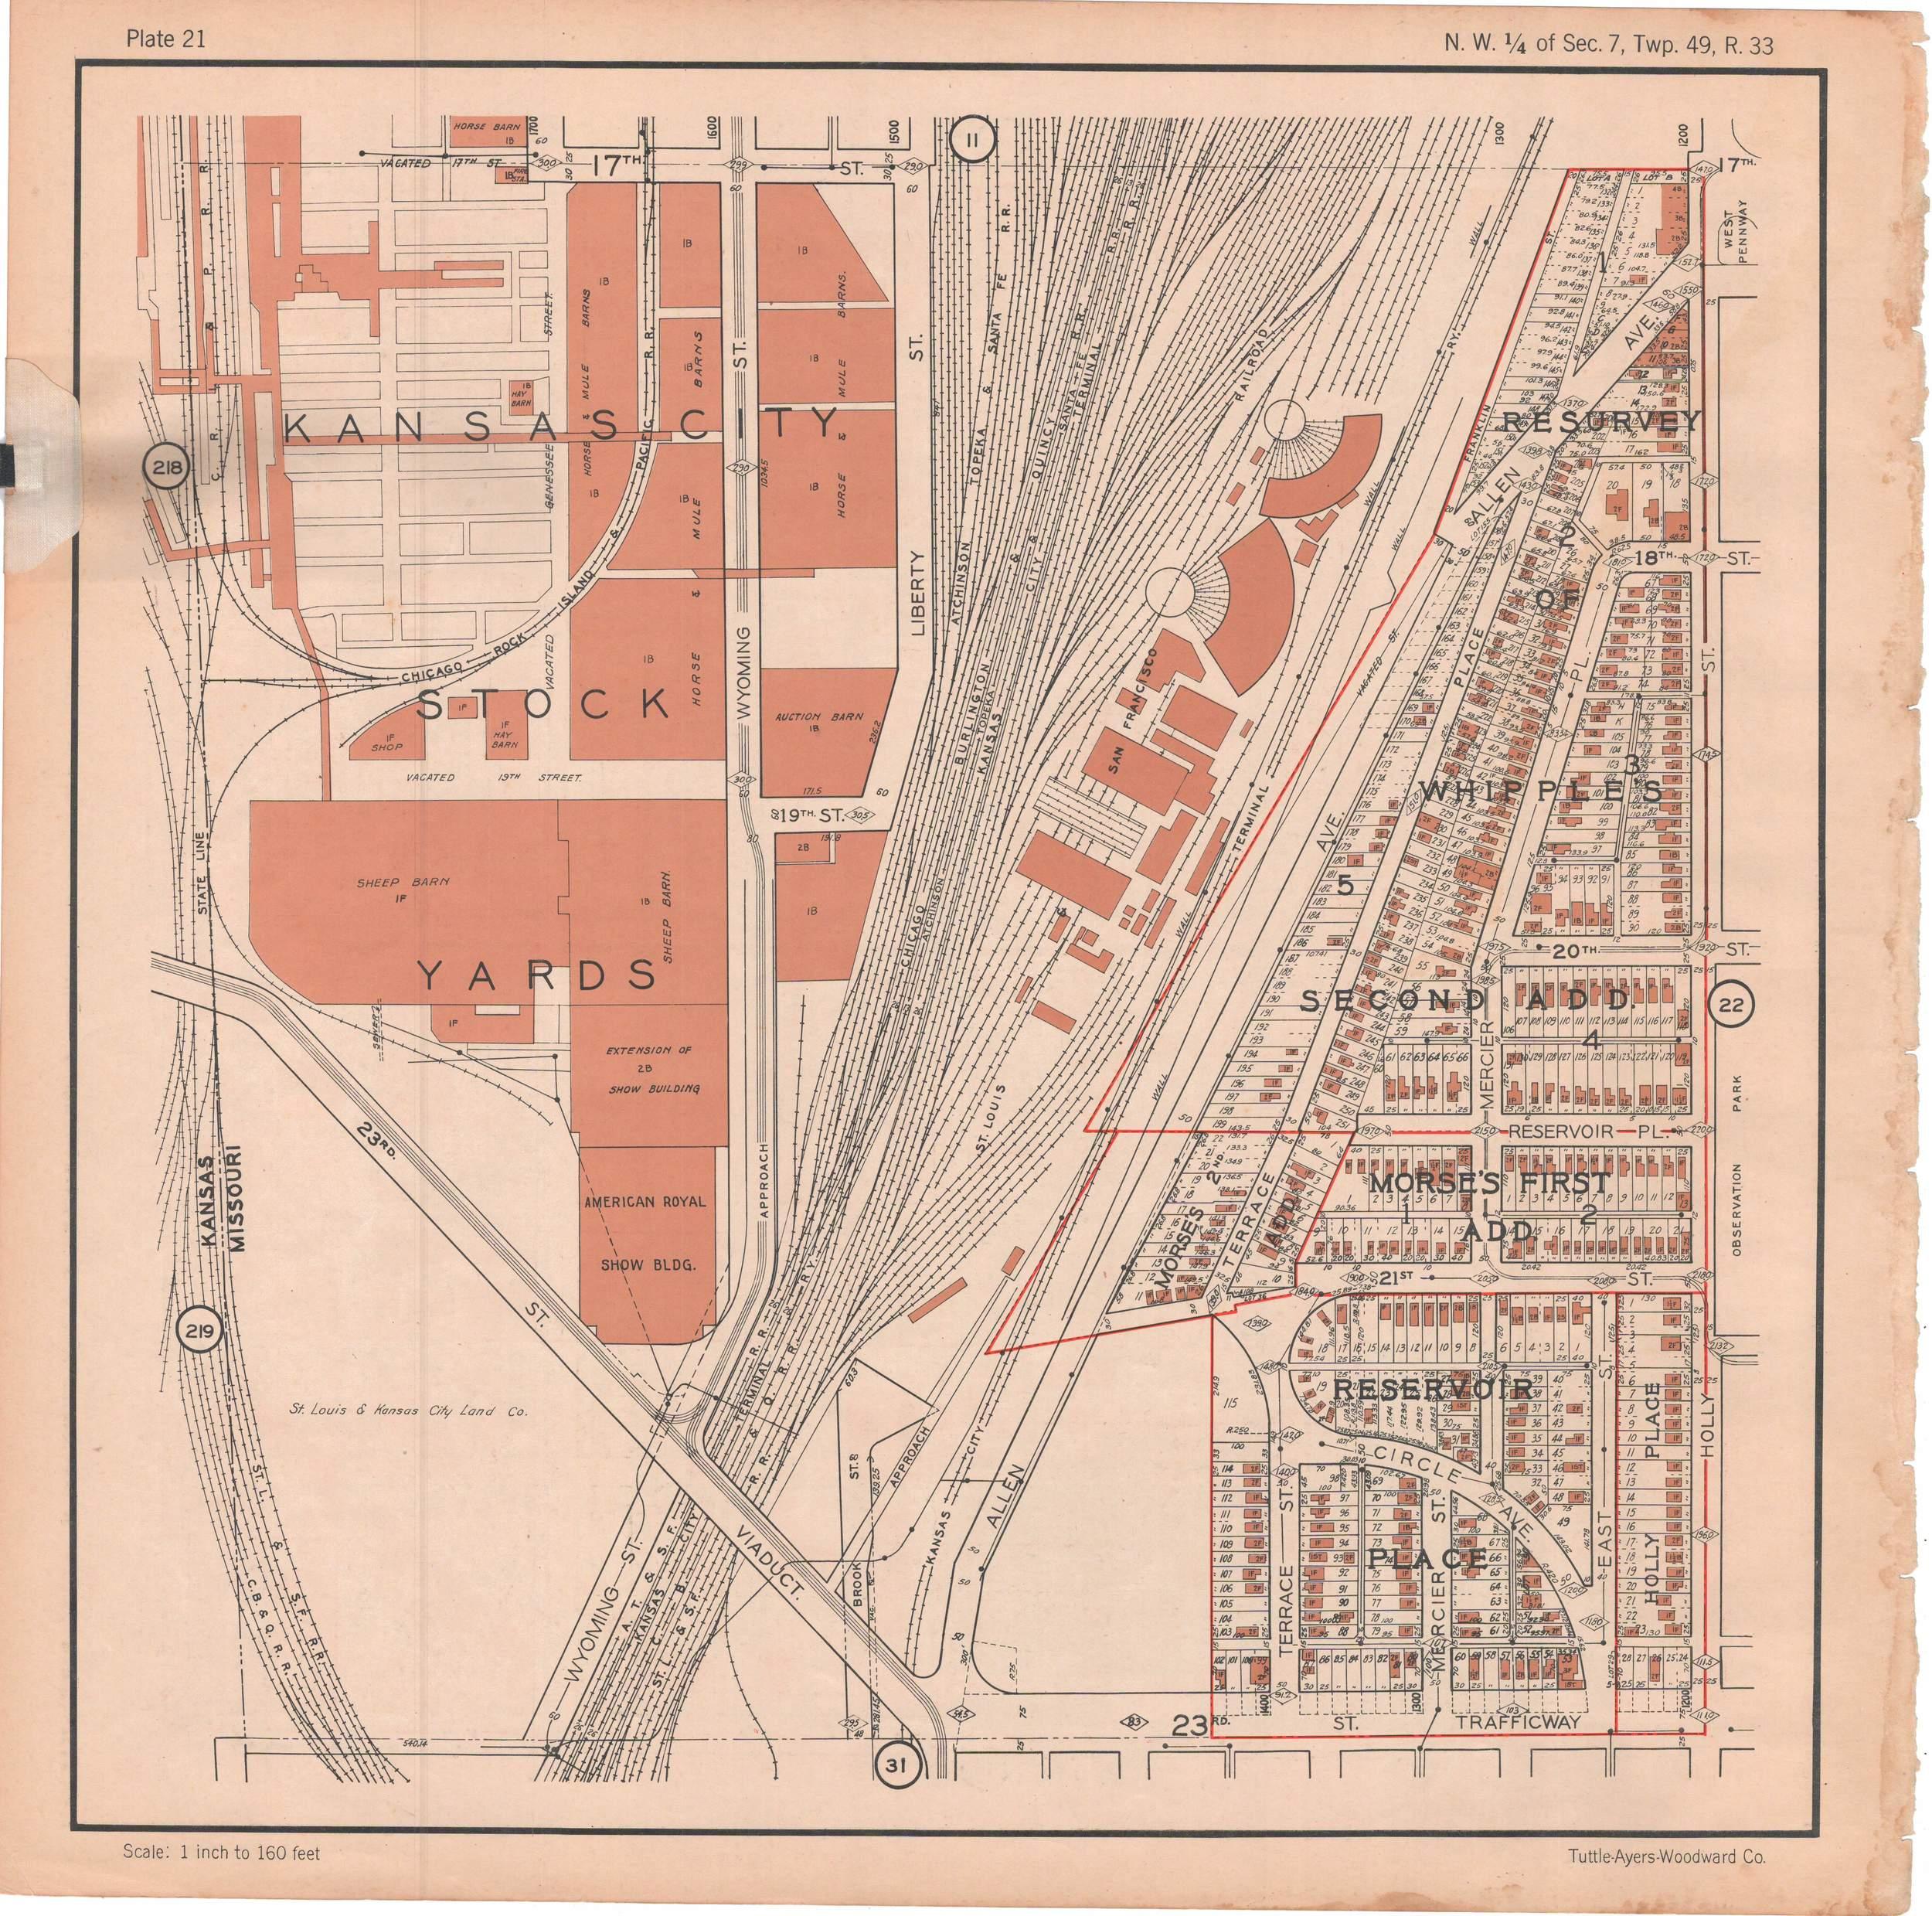 1925 TUTTLE_AYERS_Plate 21.JPG